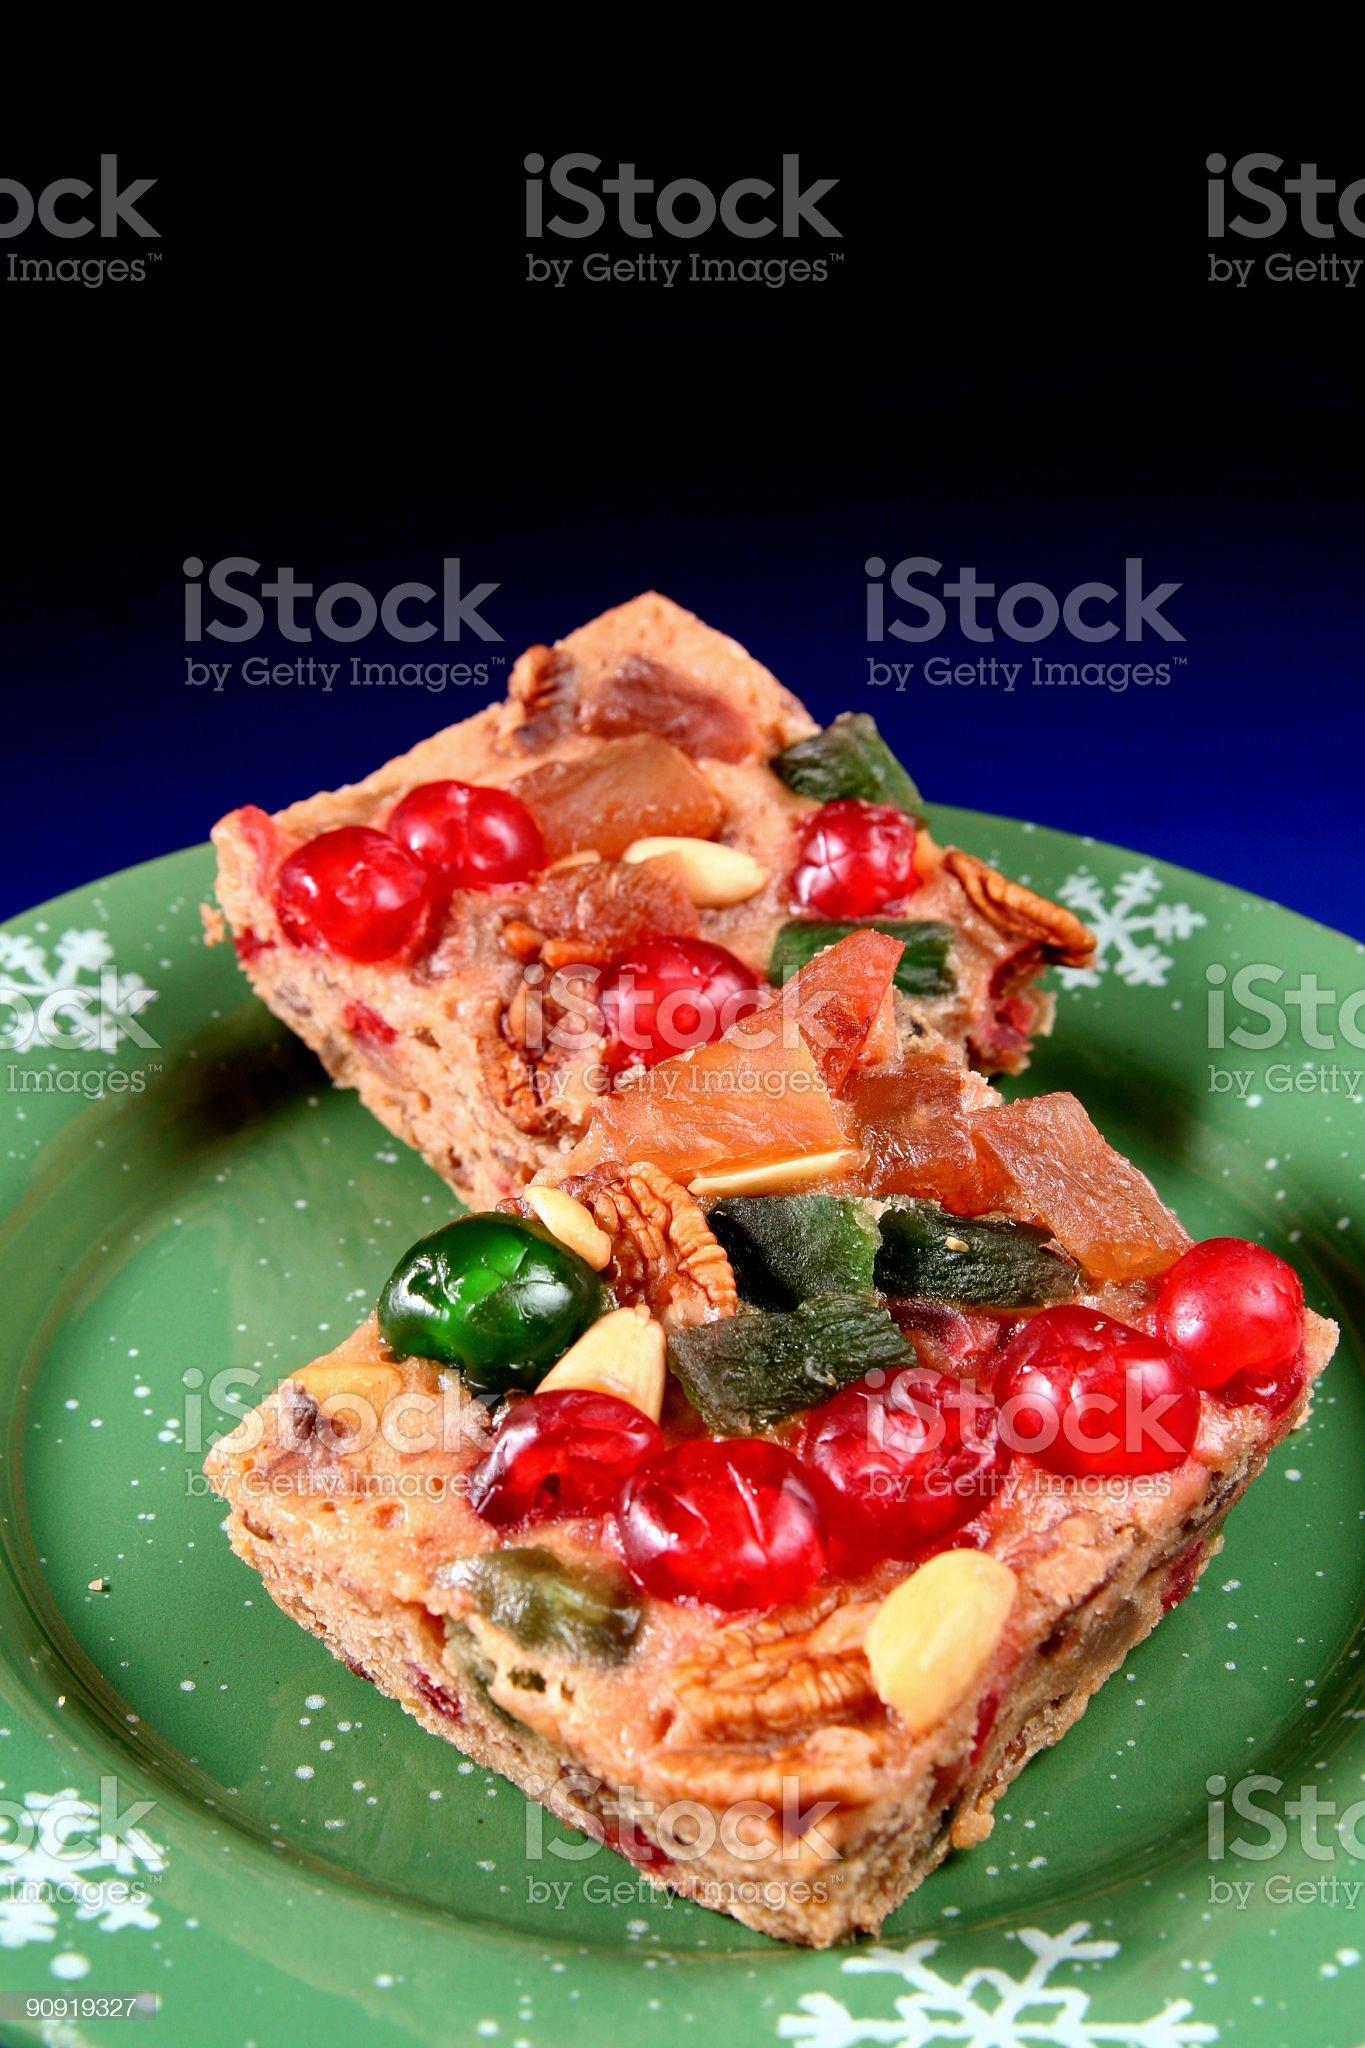 Fruitcake the Holiday Tradition royalty-free stock photo